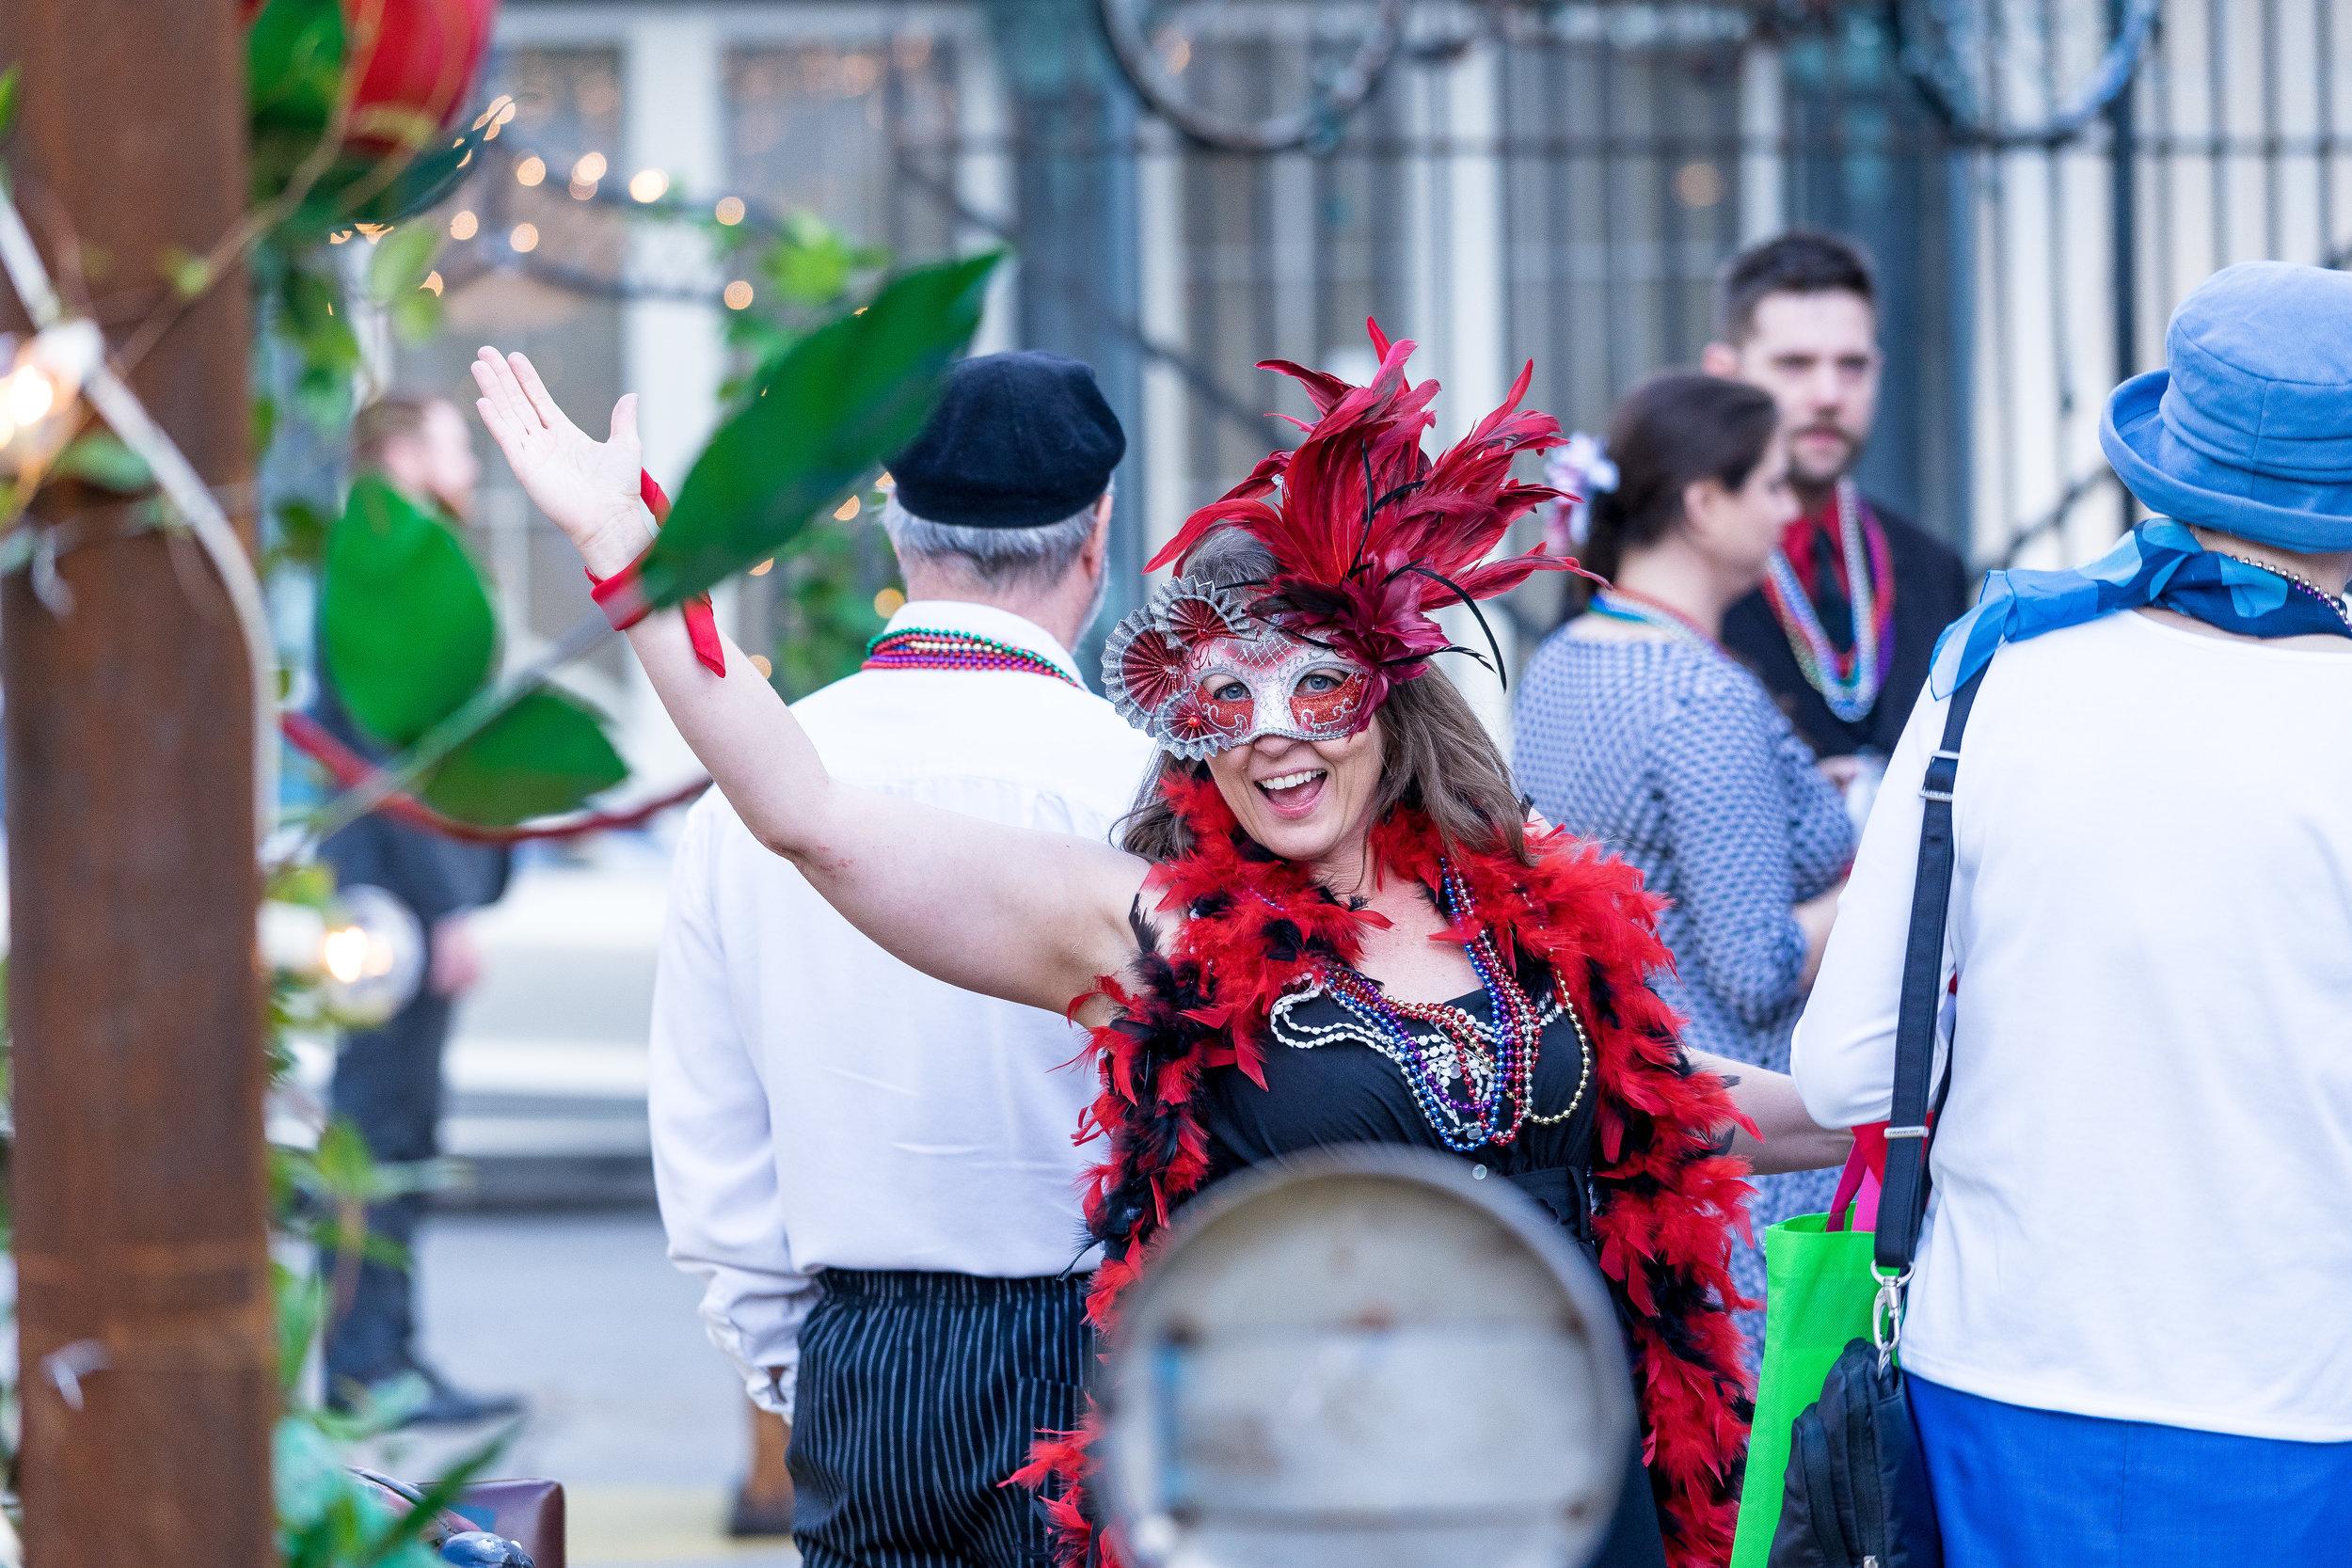 image of mardi gras attire girl waving during wedding ceremony in french quarter destination wedding photographer